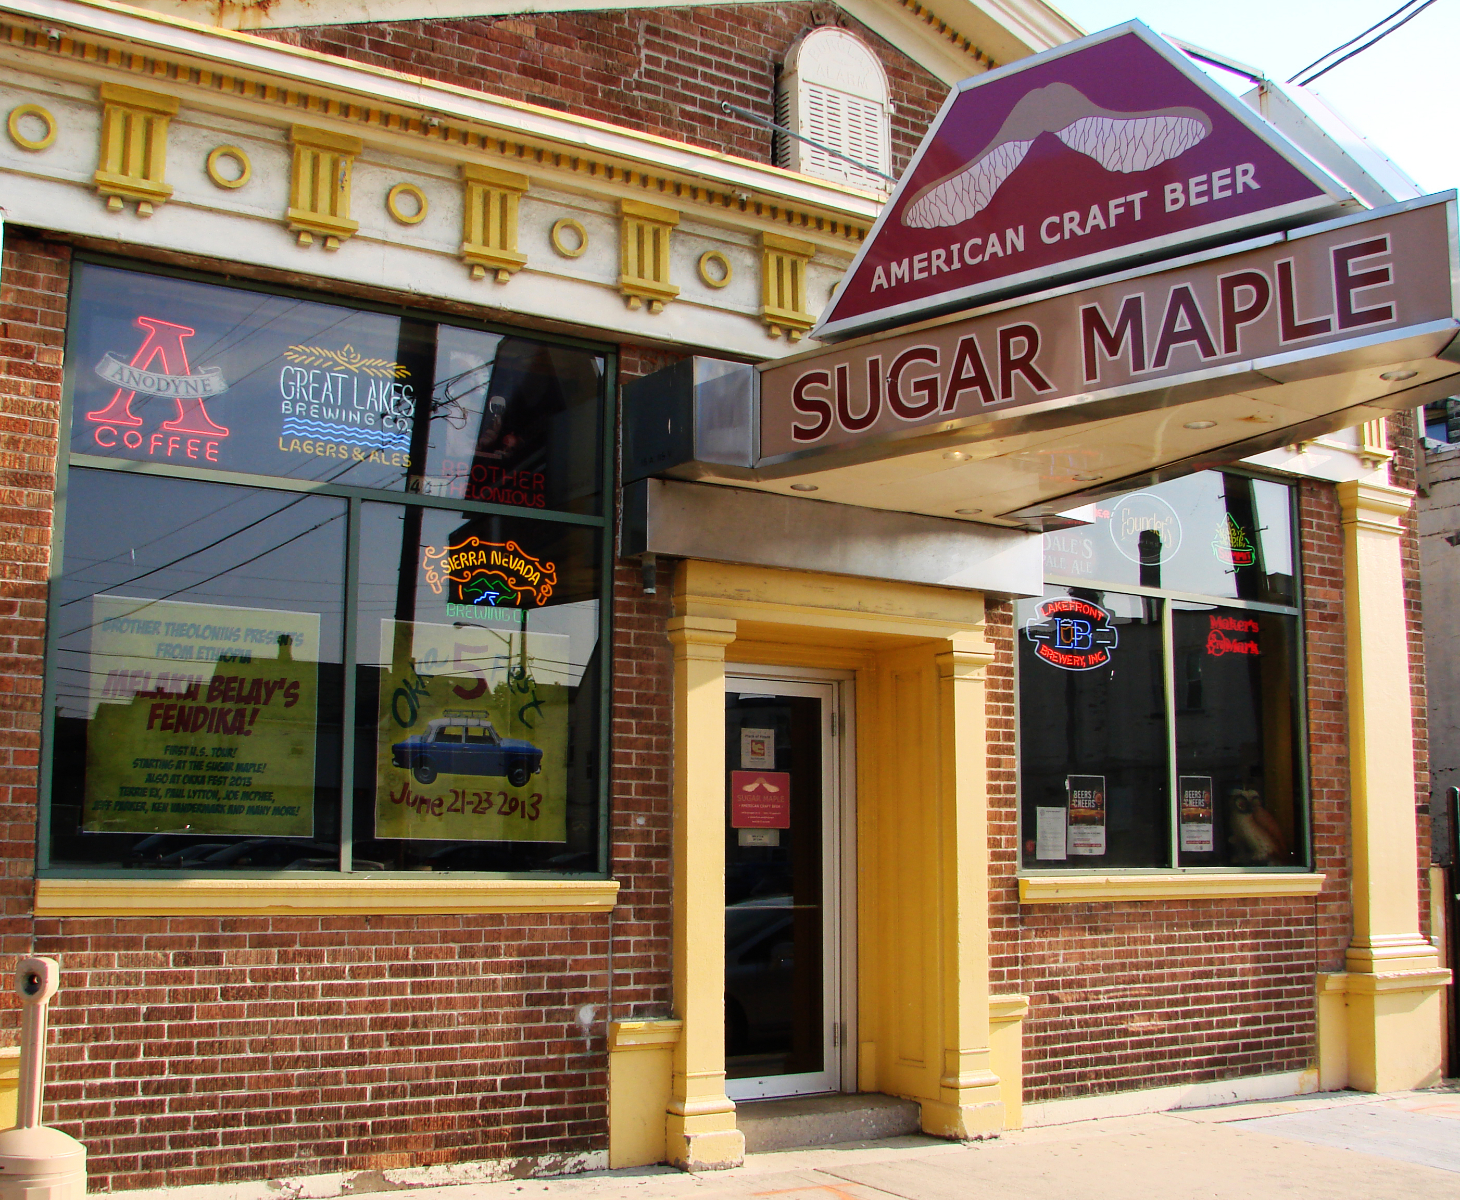 Sugar Maple. Photo taken May 29th, 2013 by Nastassia Putz.